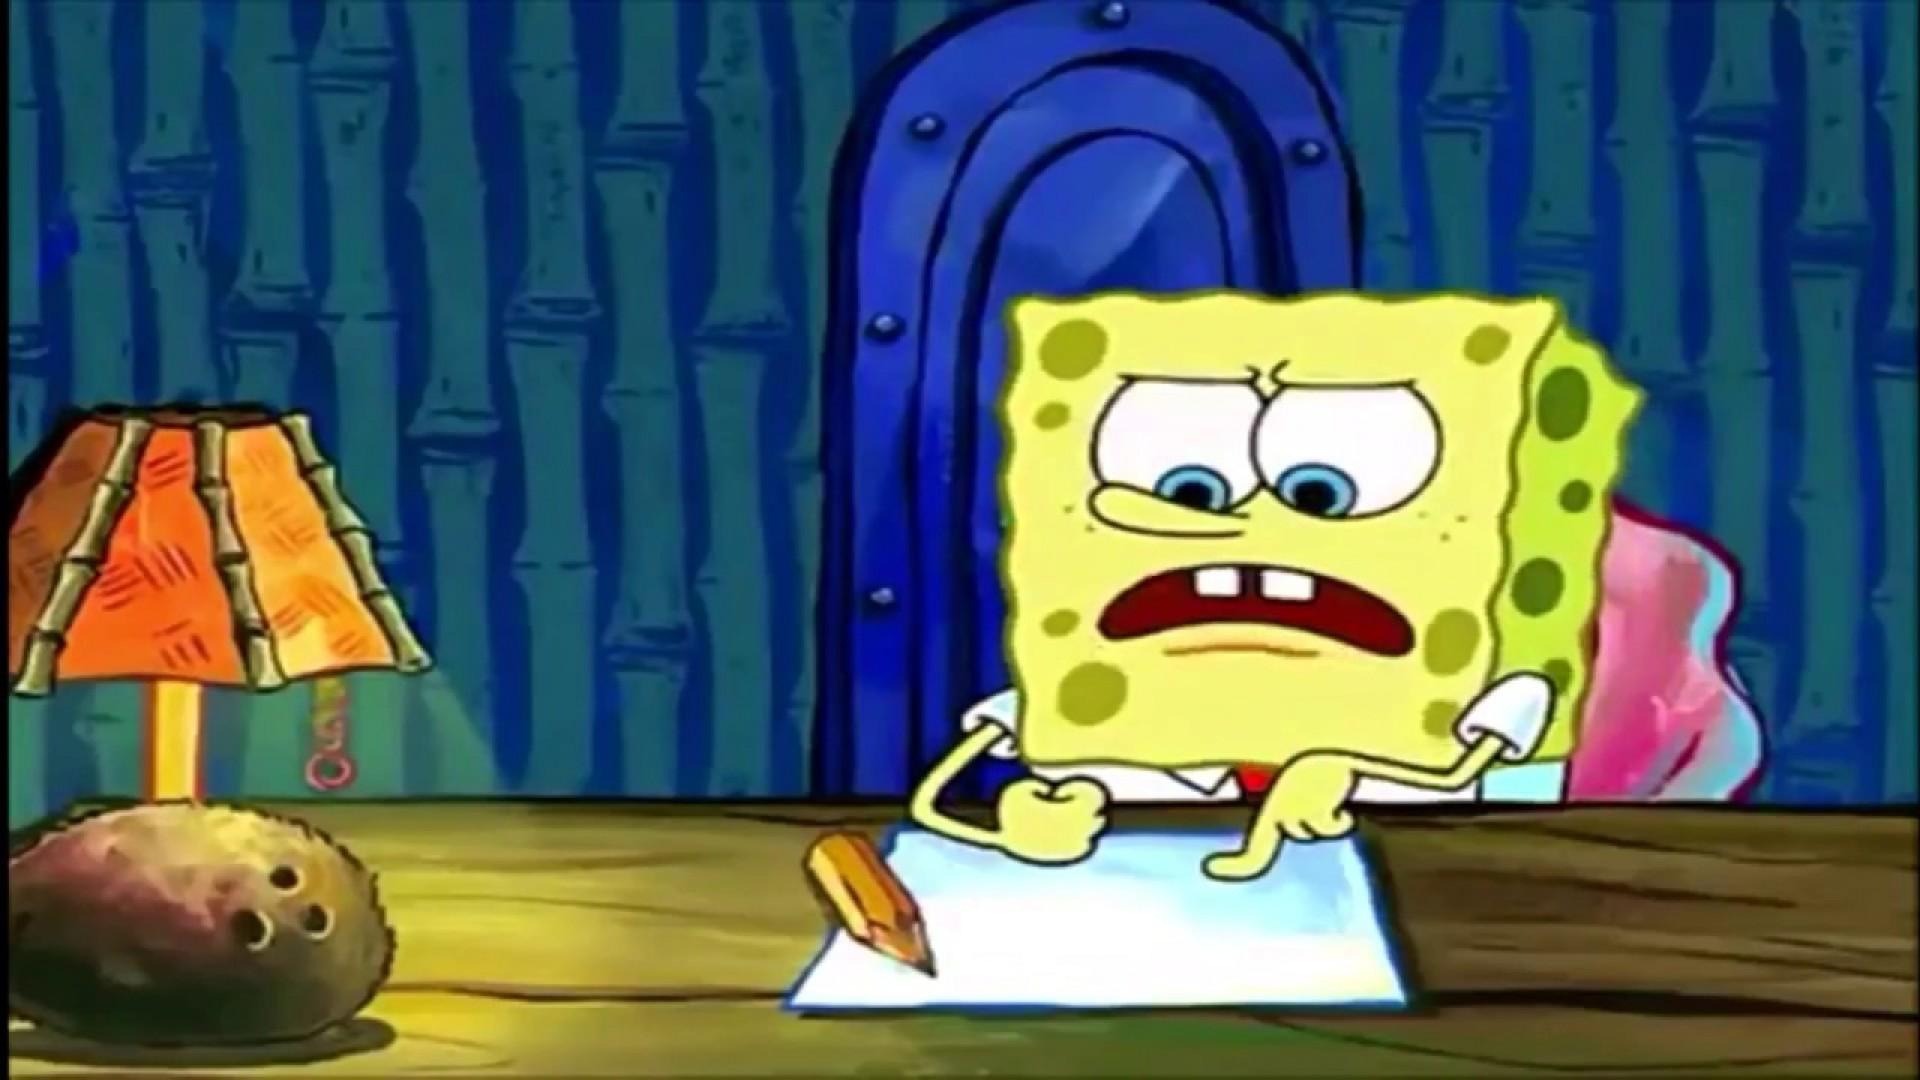 012 Essay Example Spongebob The Unforgettable Font Copy And Paste Gif Meme 1920